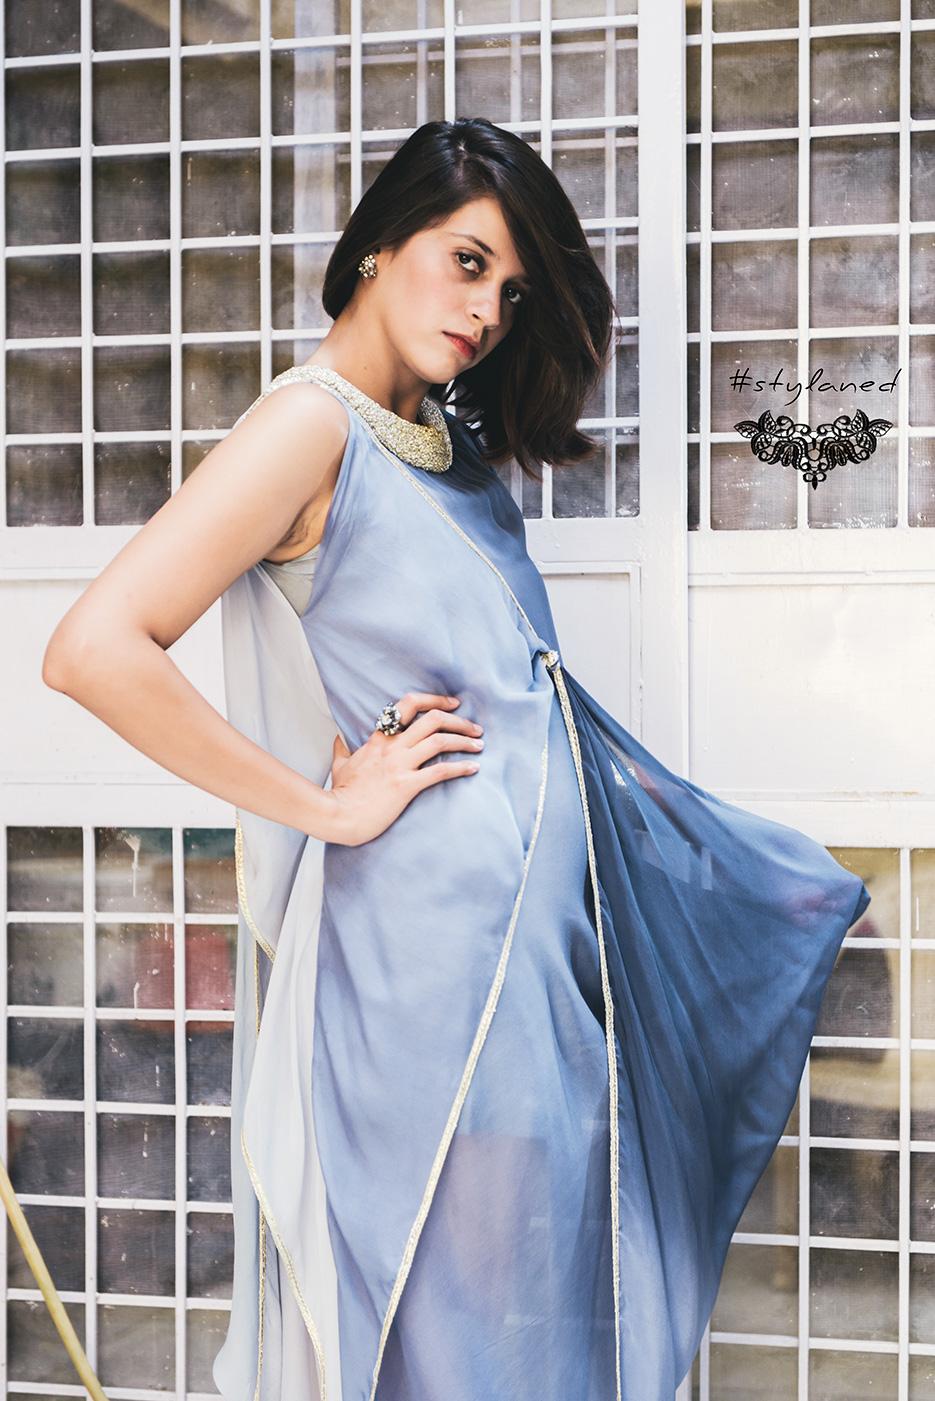 #stylaned Fashion features by photographer Naina Redhu and designer / stylist / blogger Akanksha Redhu for Jenjum Gadi